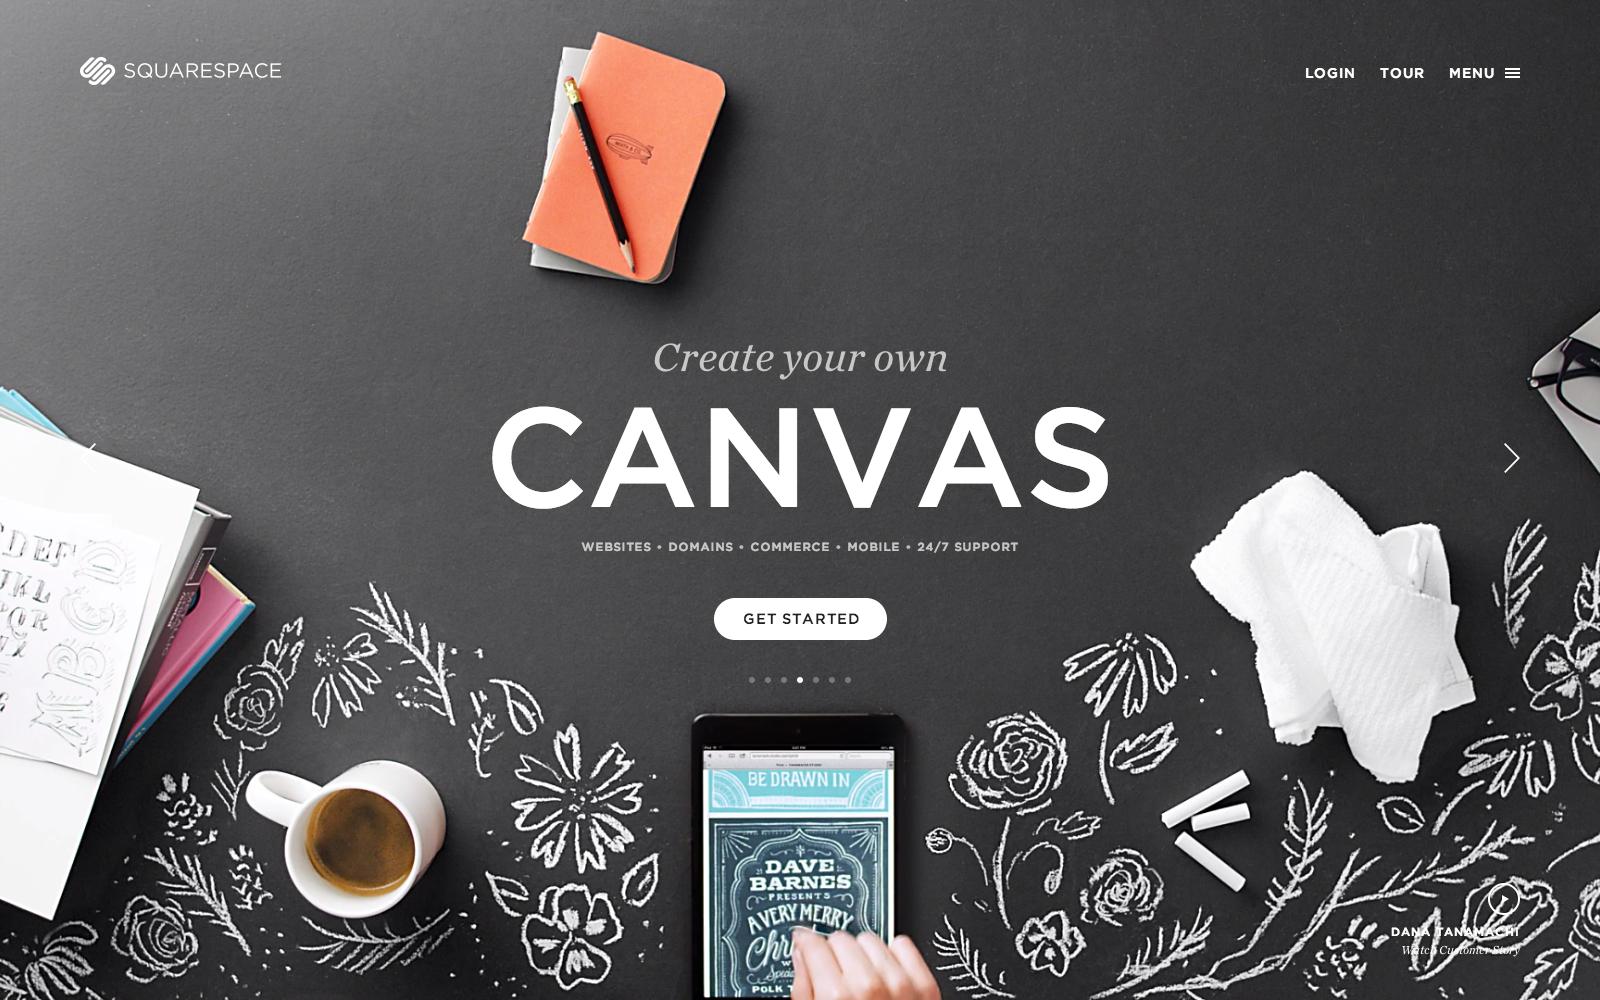 Create Your Own Canvas Squarespace Squarespace Pinterest Blog